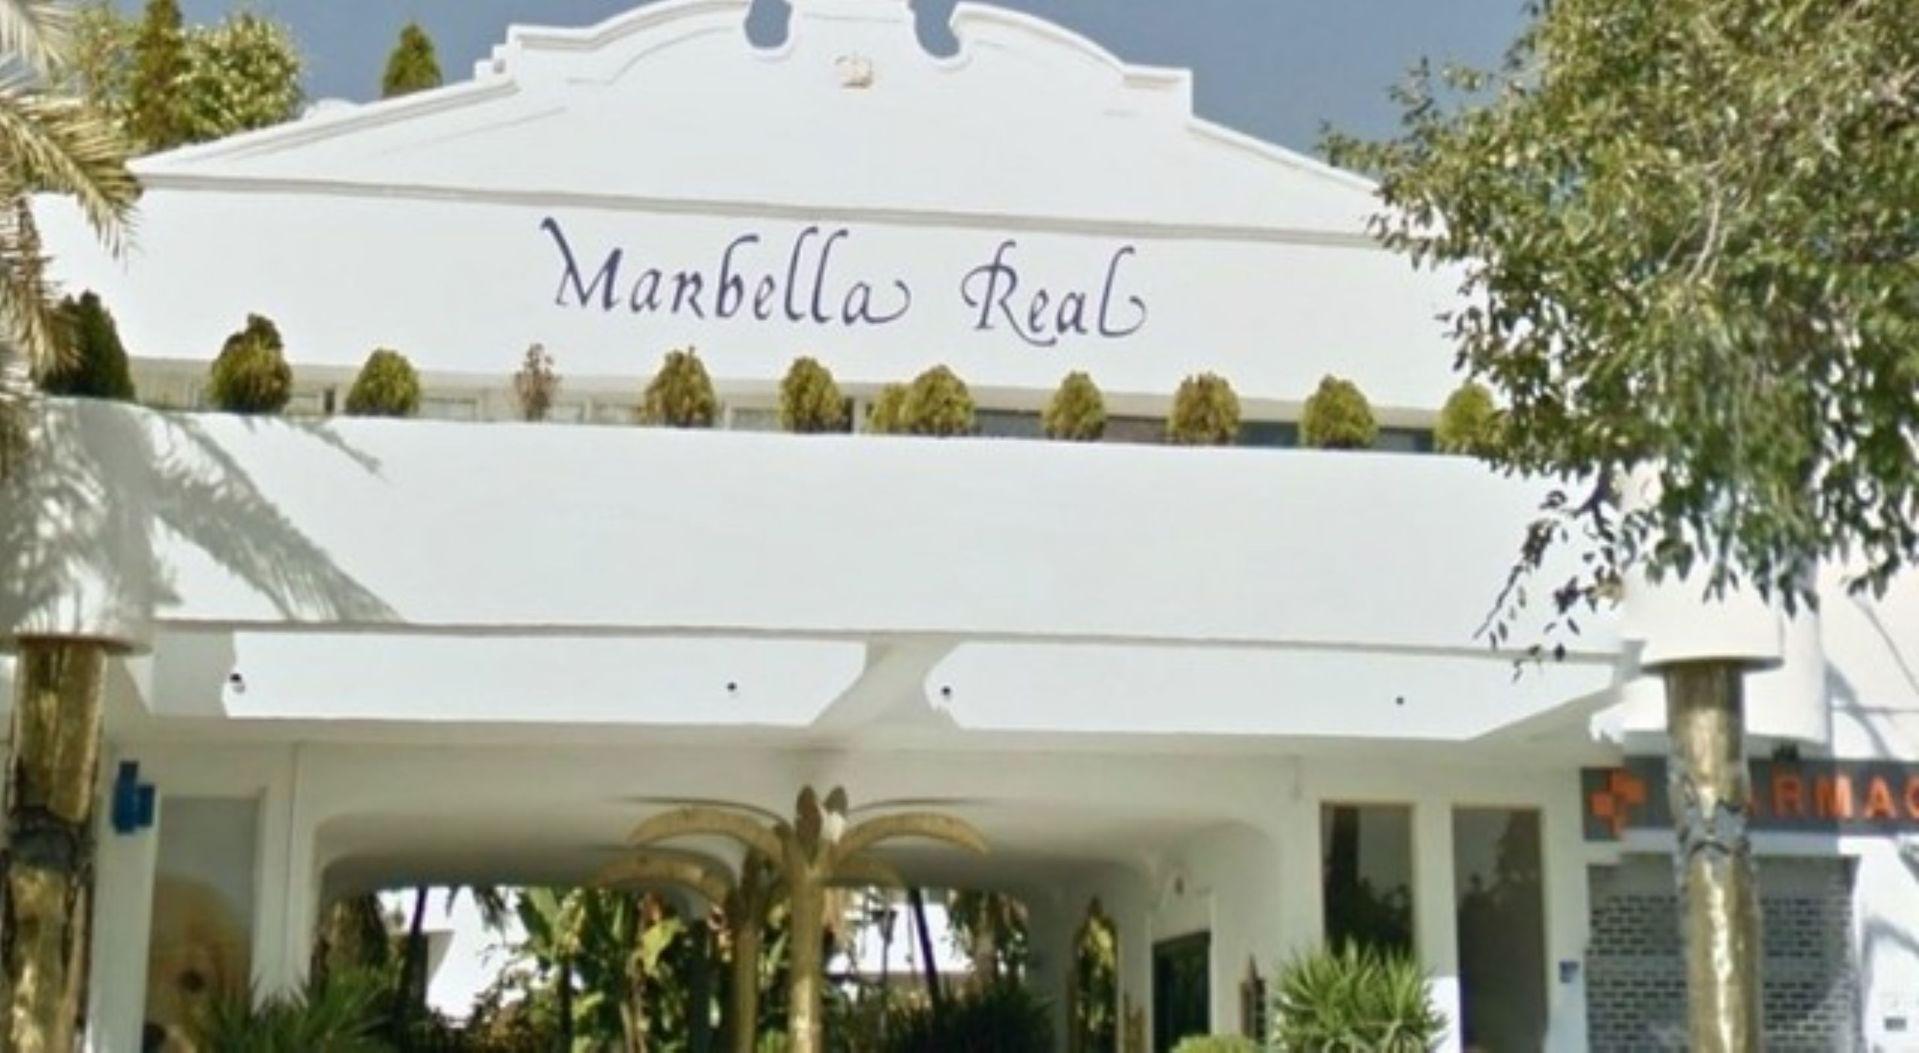 Apartment in Marbella, holiday rentals